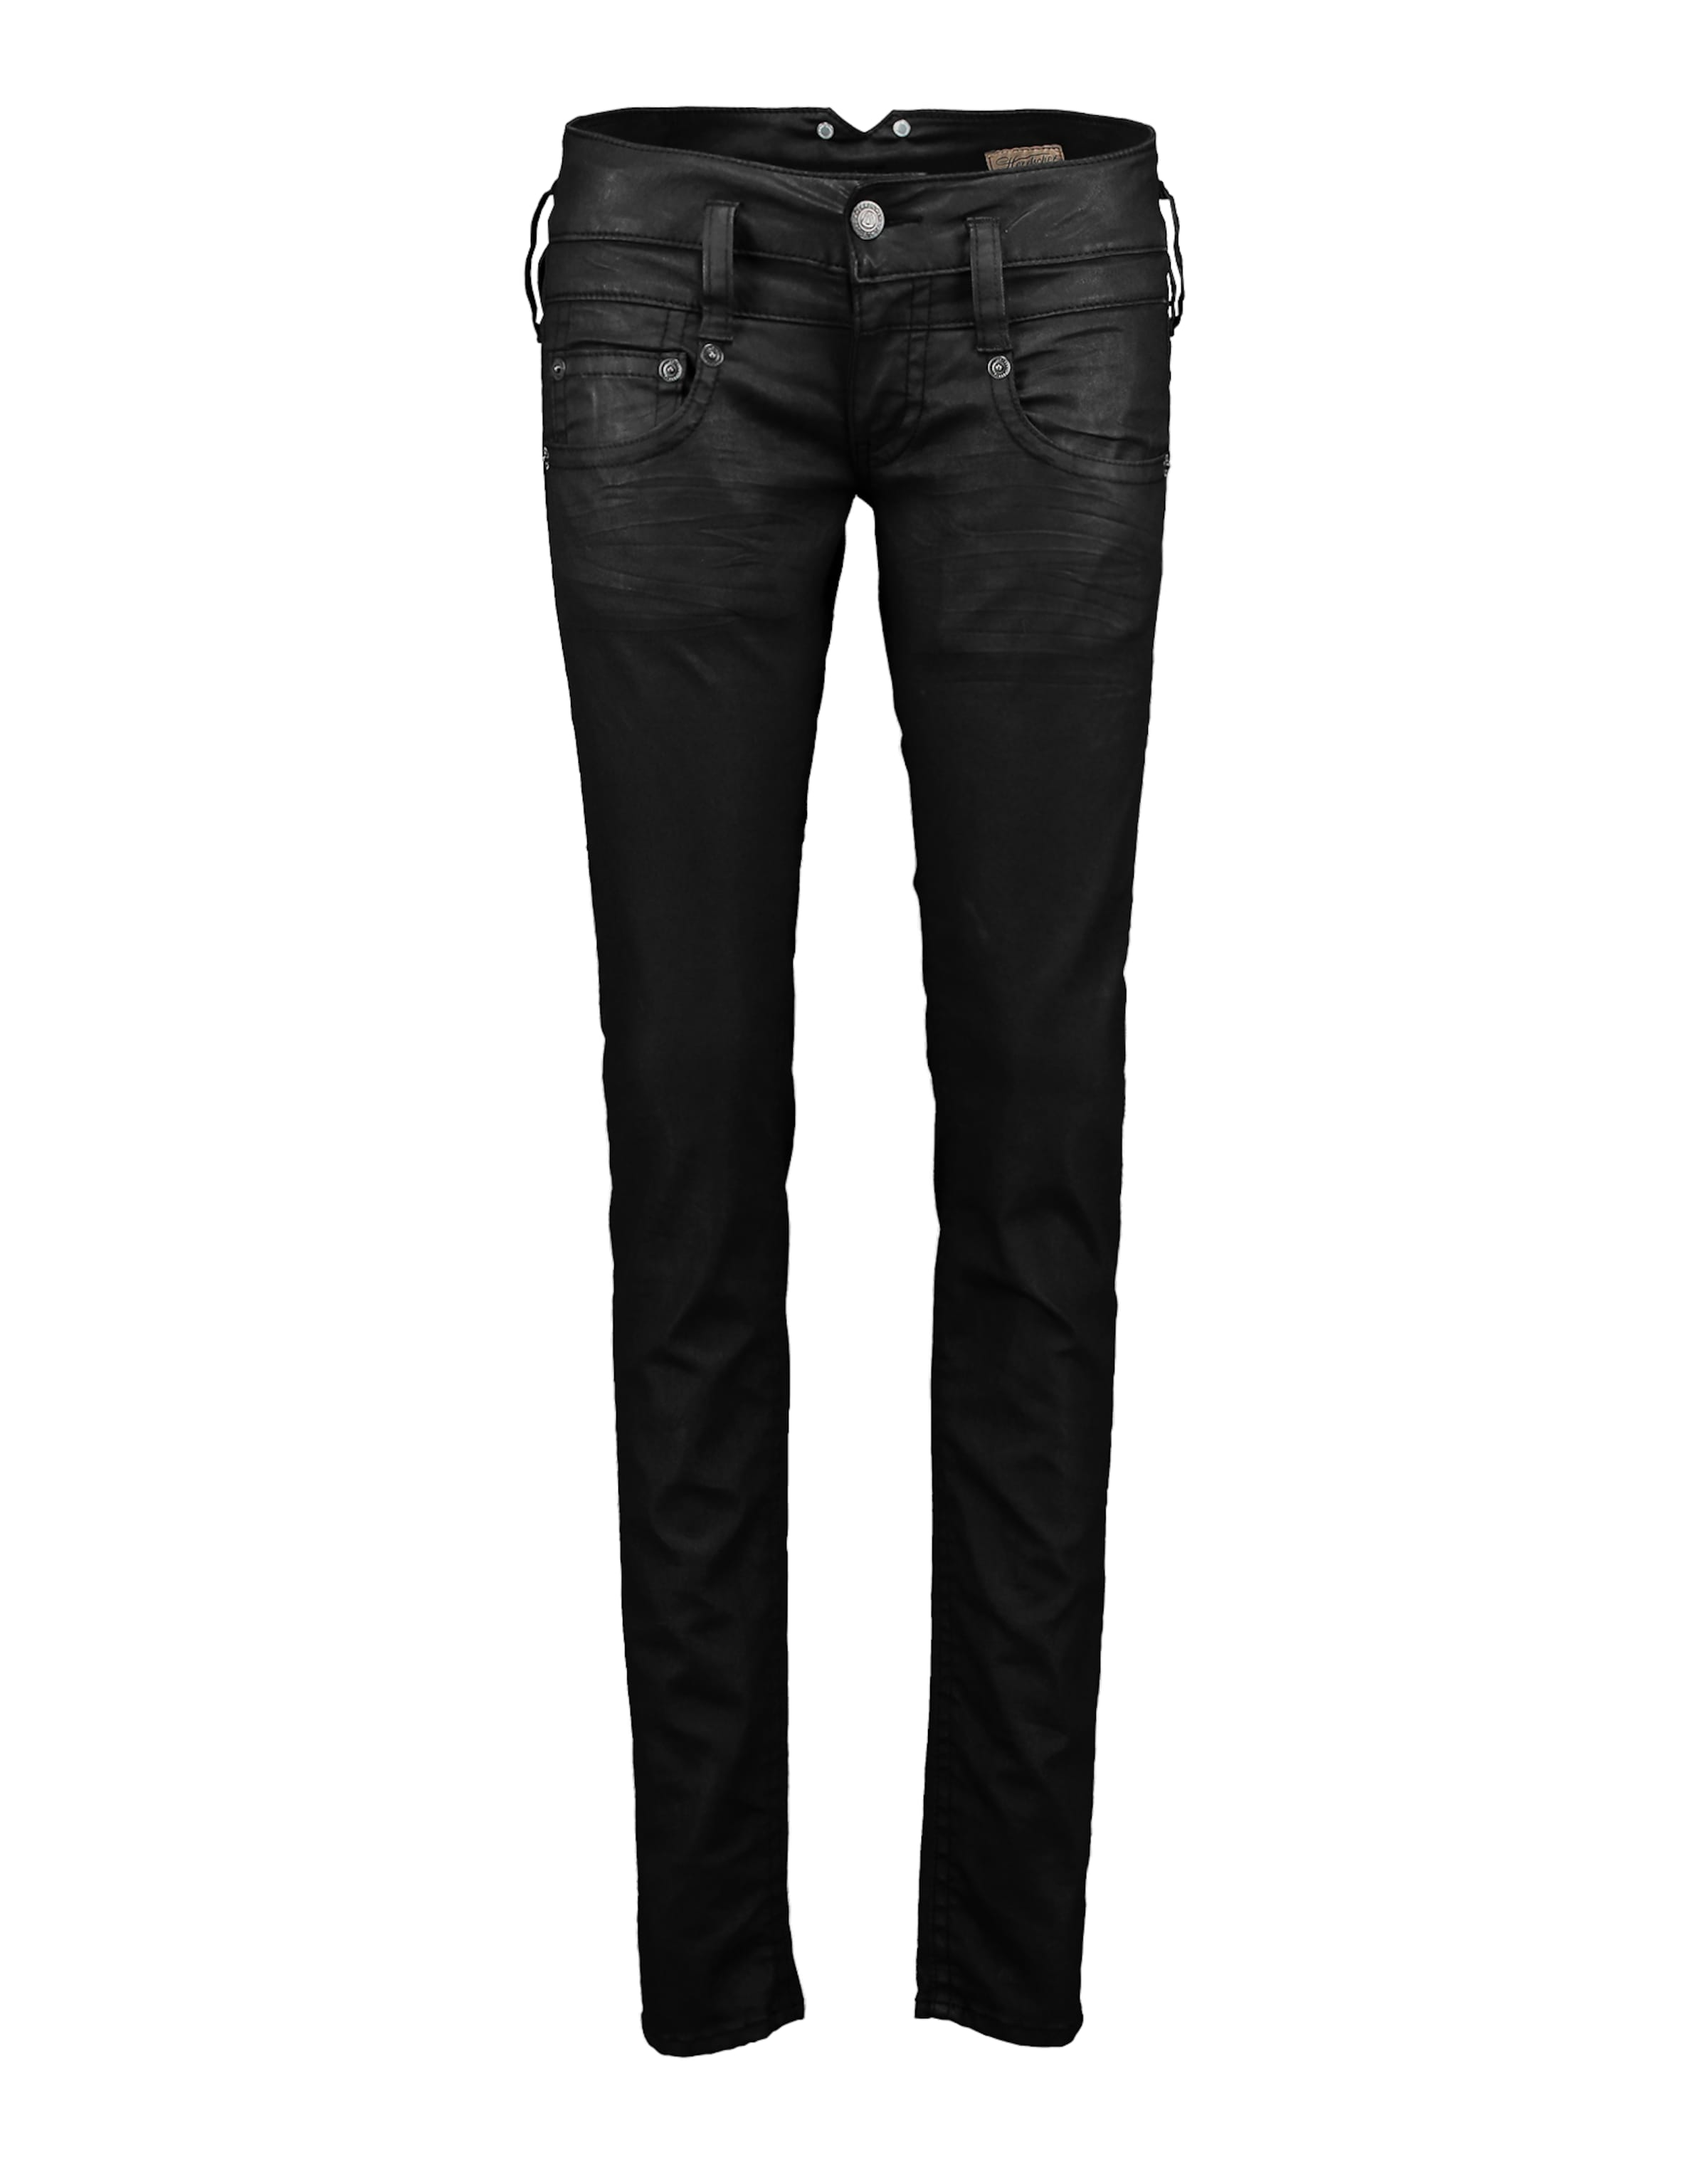 Herrlicher Black Jeans Denim Powerstretch 'pitch' Aus In Skinny CxBErdoQWe